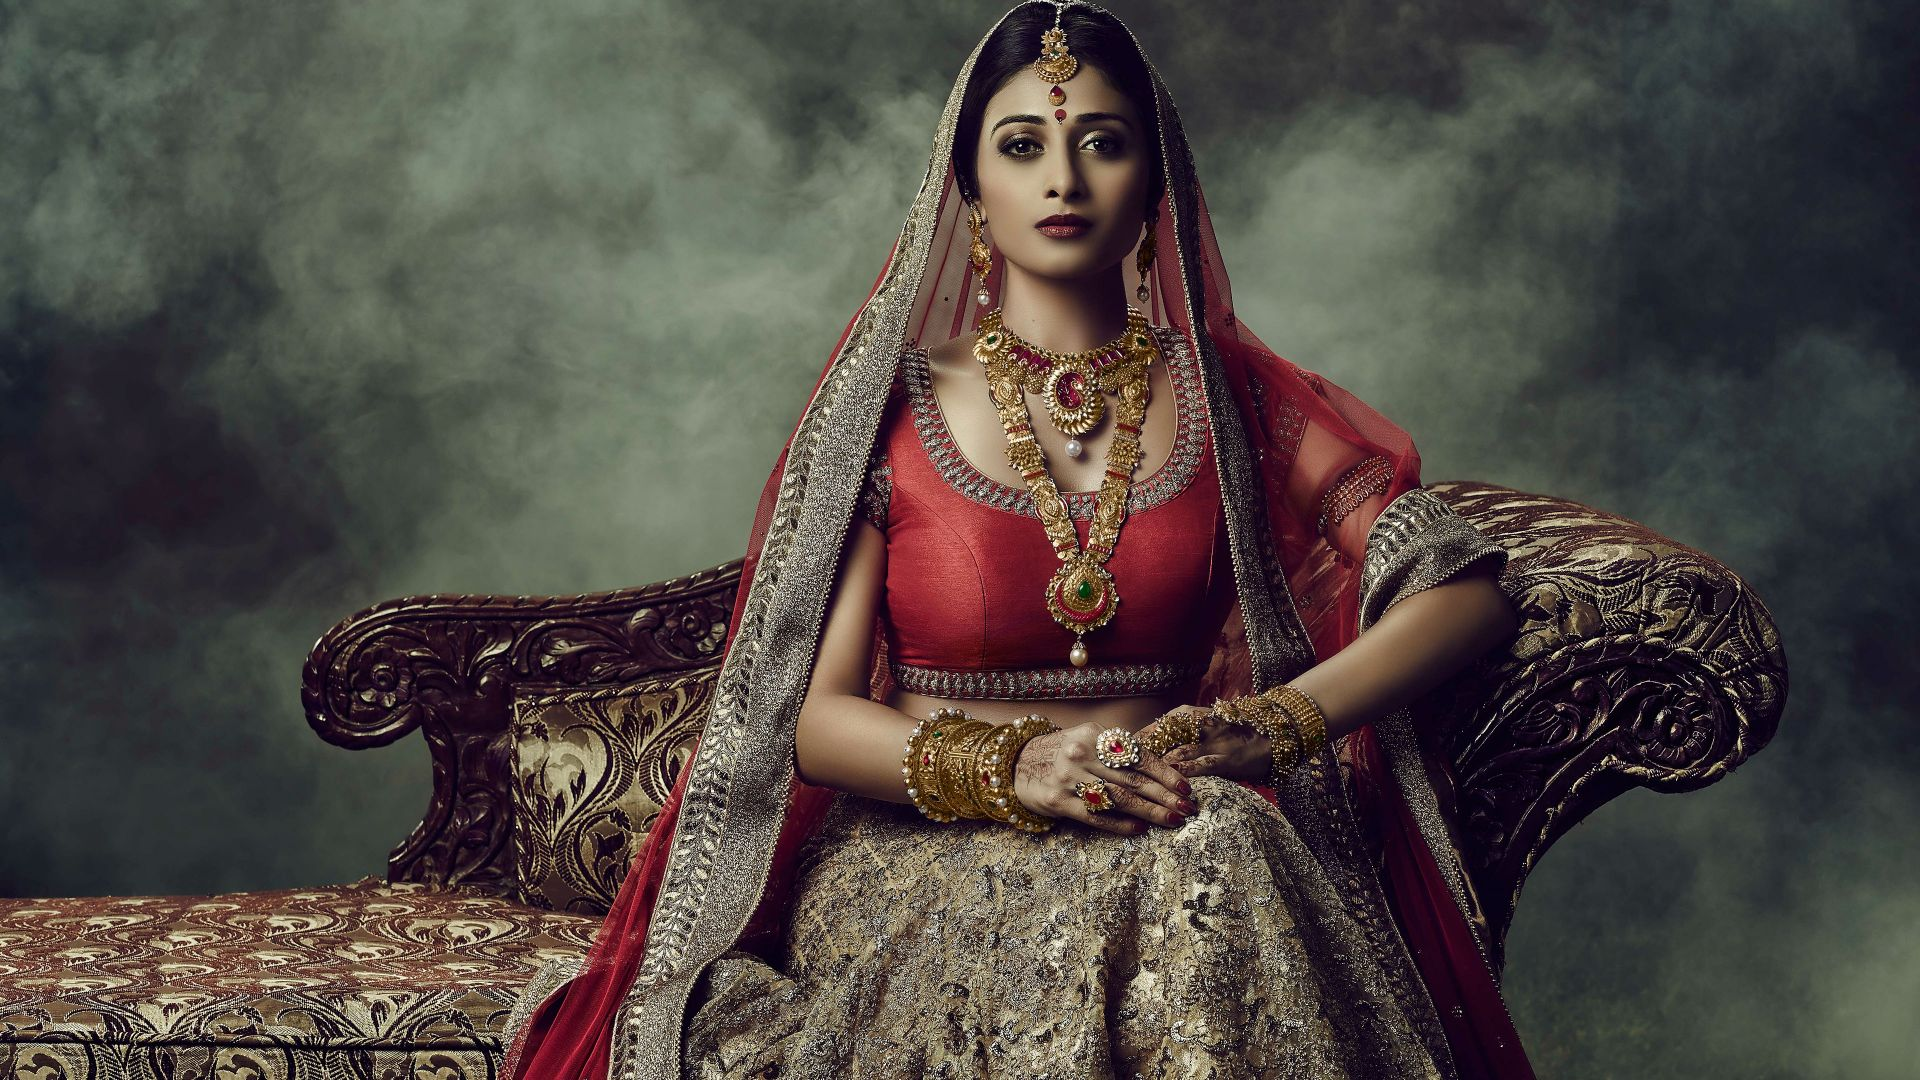 Wallpaper Indian wedding dress, girl model, sofa